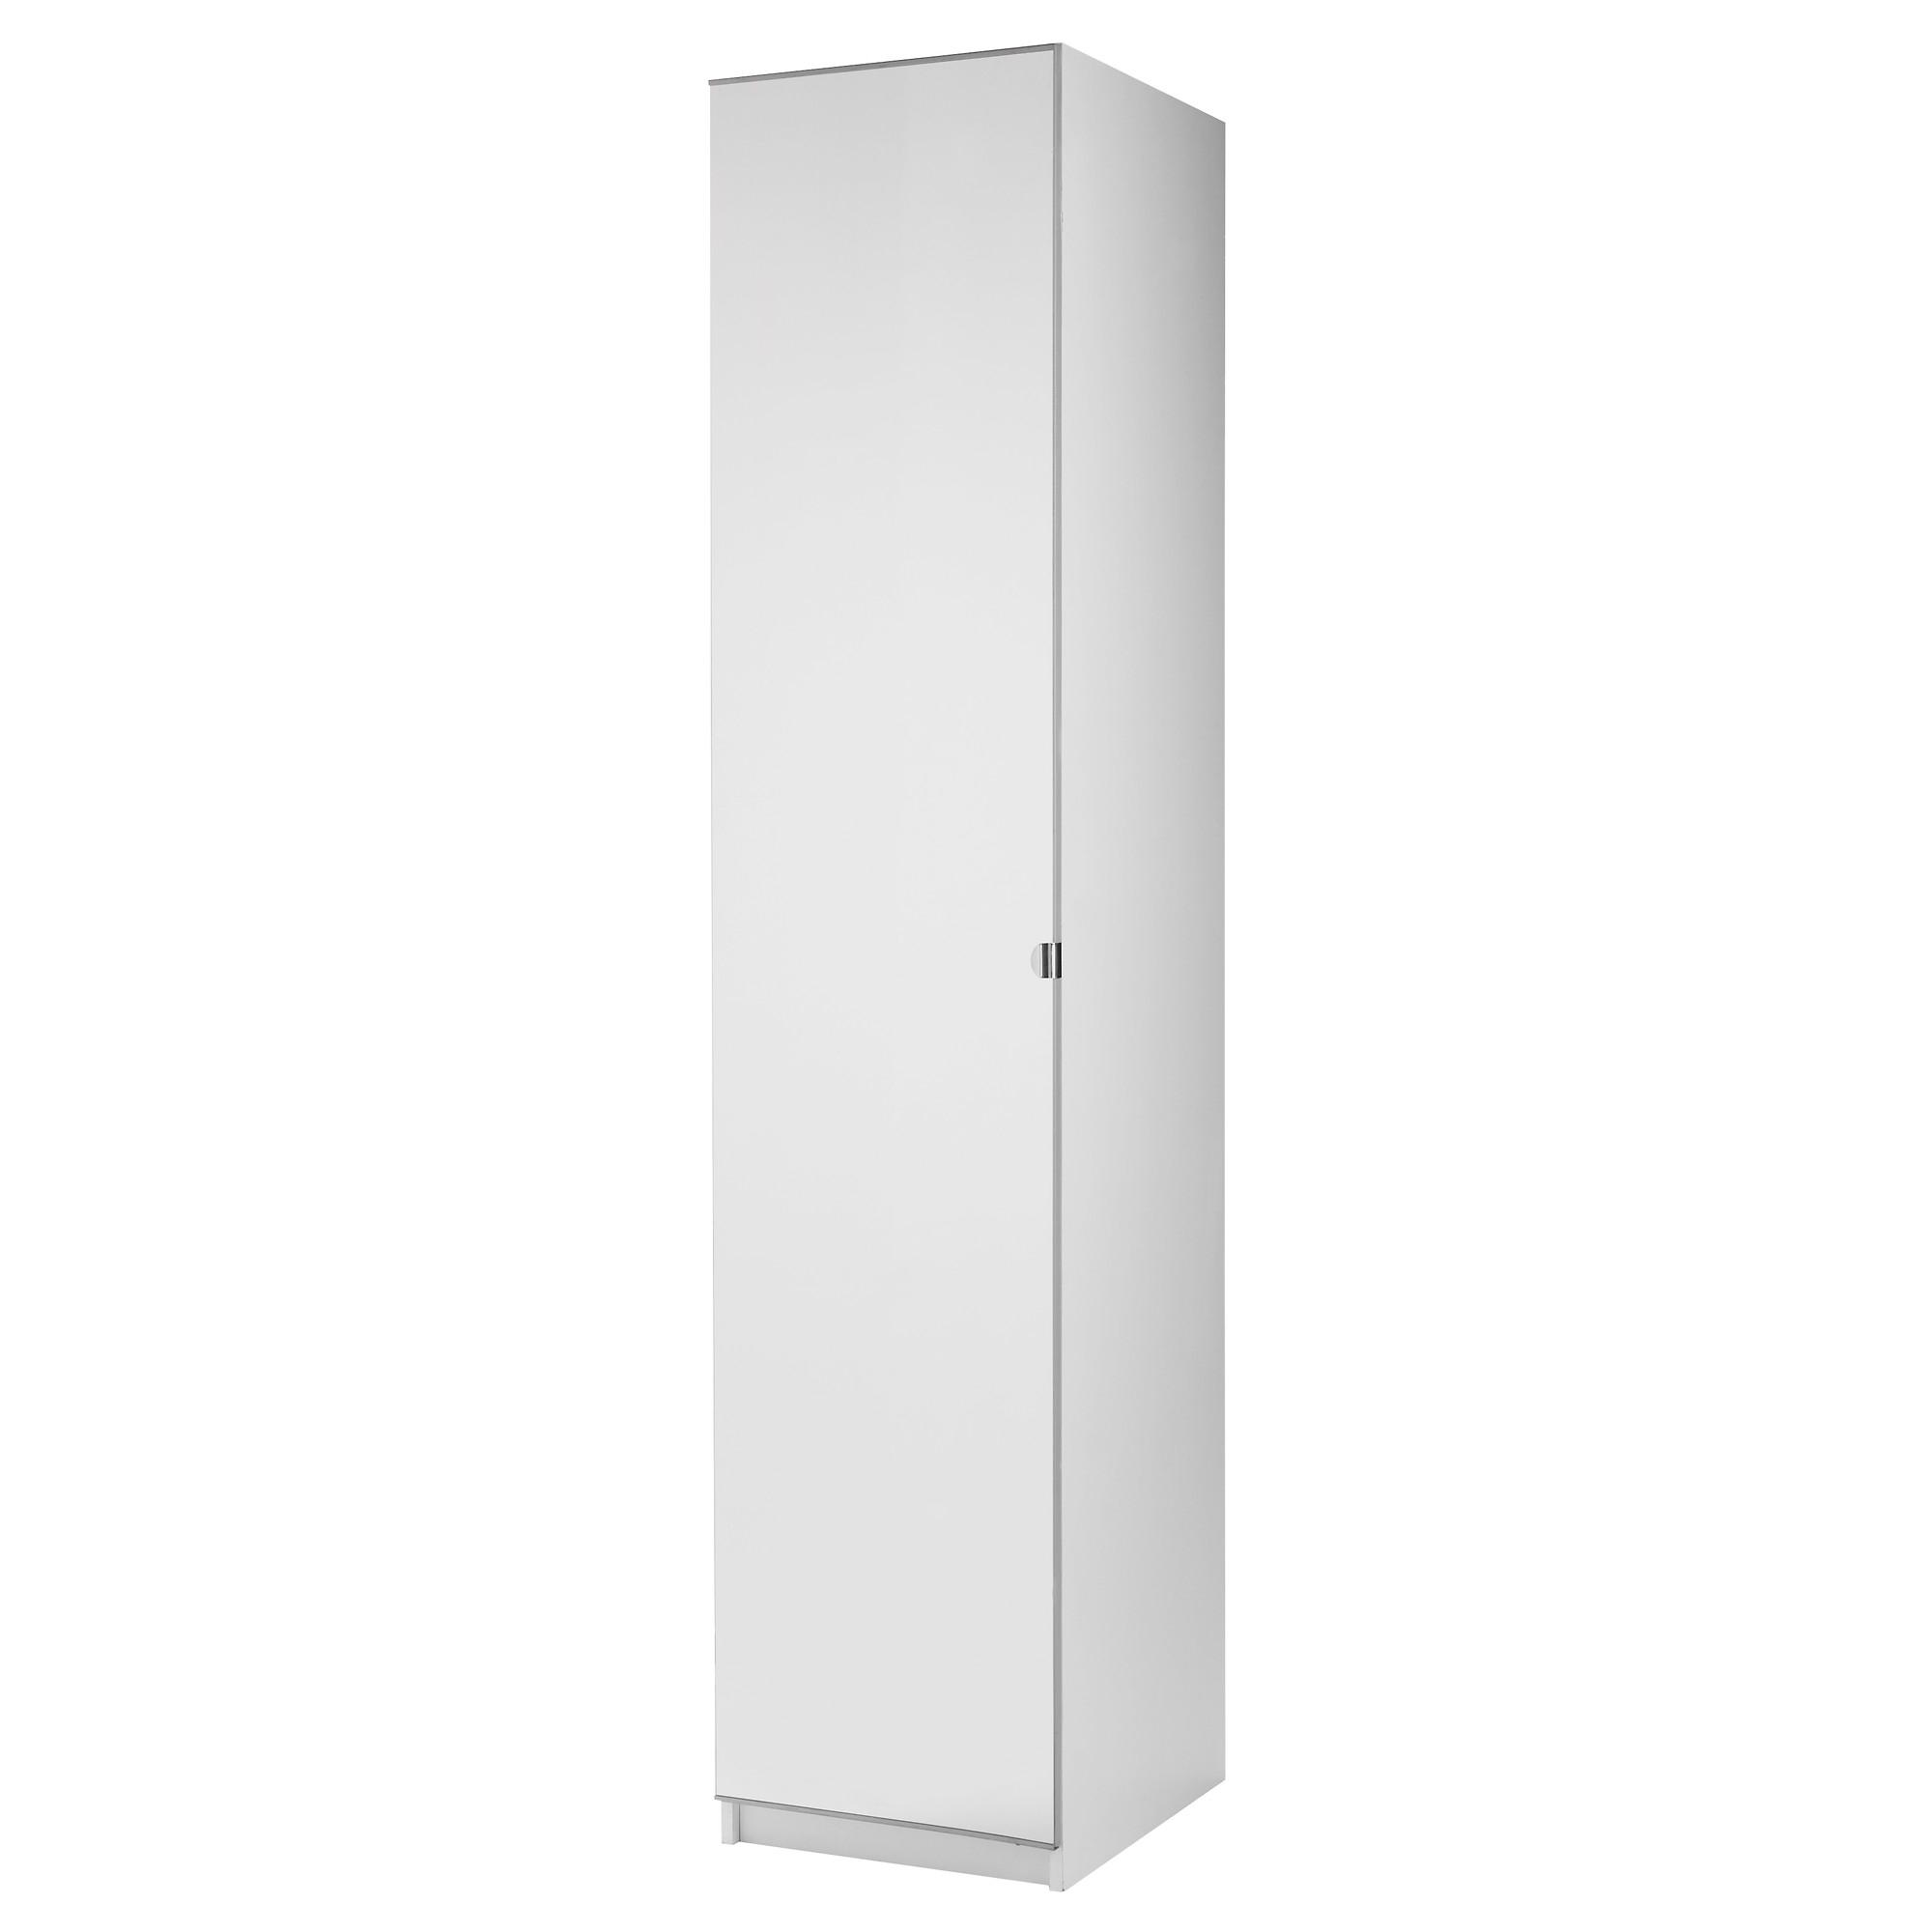 Pax armario con 1 puerta - Ikea armarios modulares ...